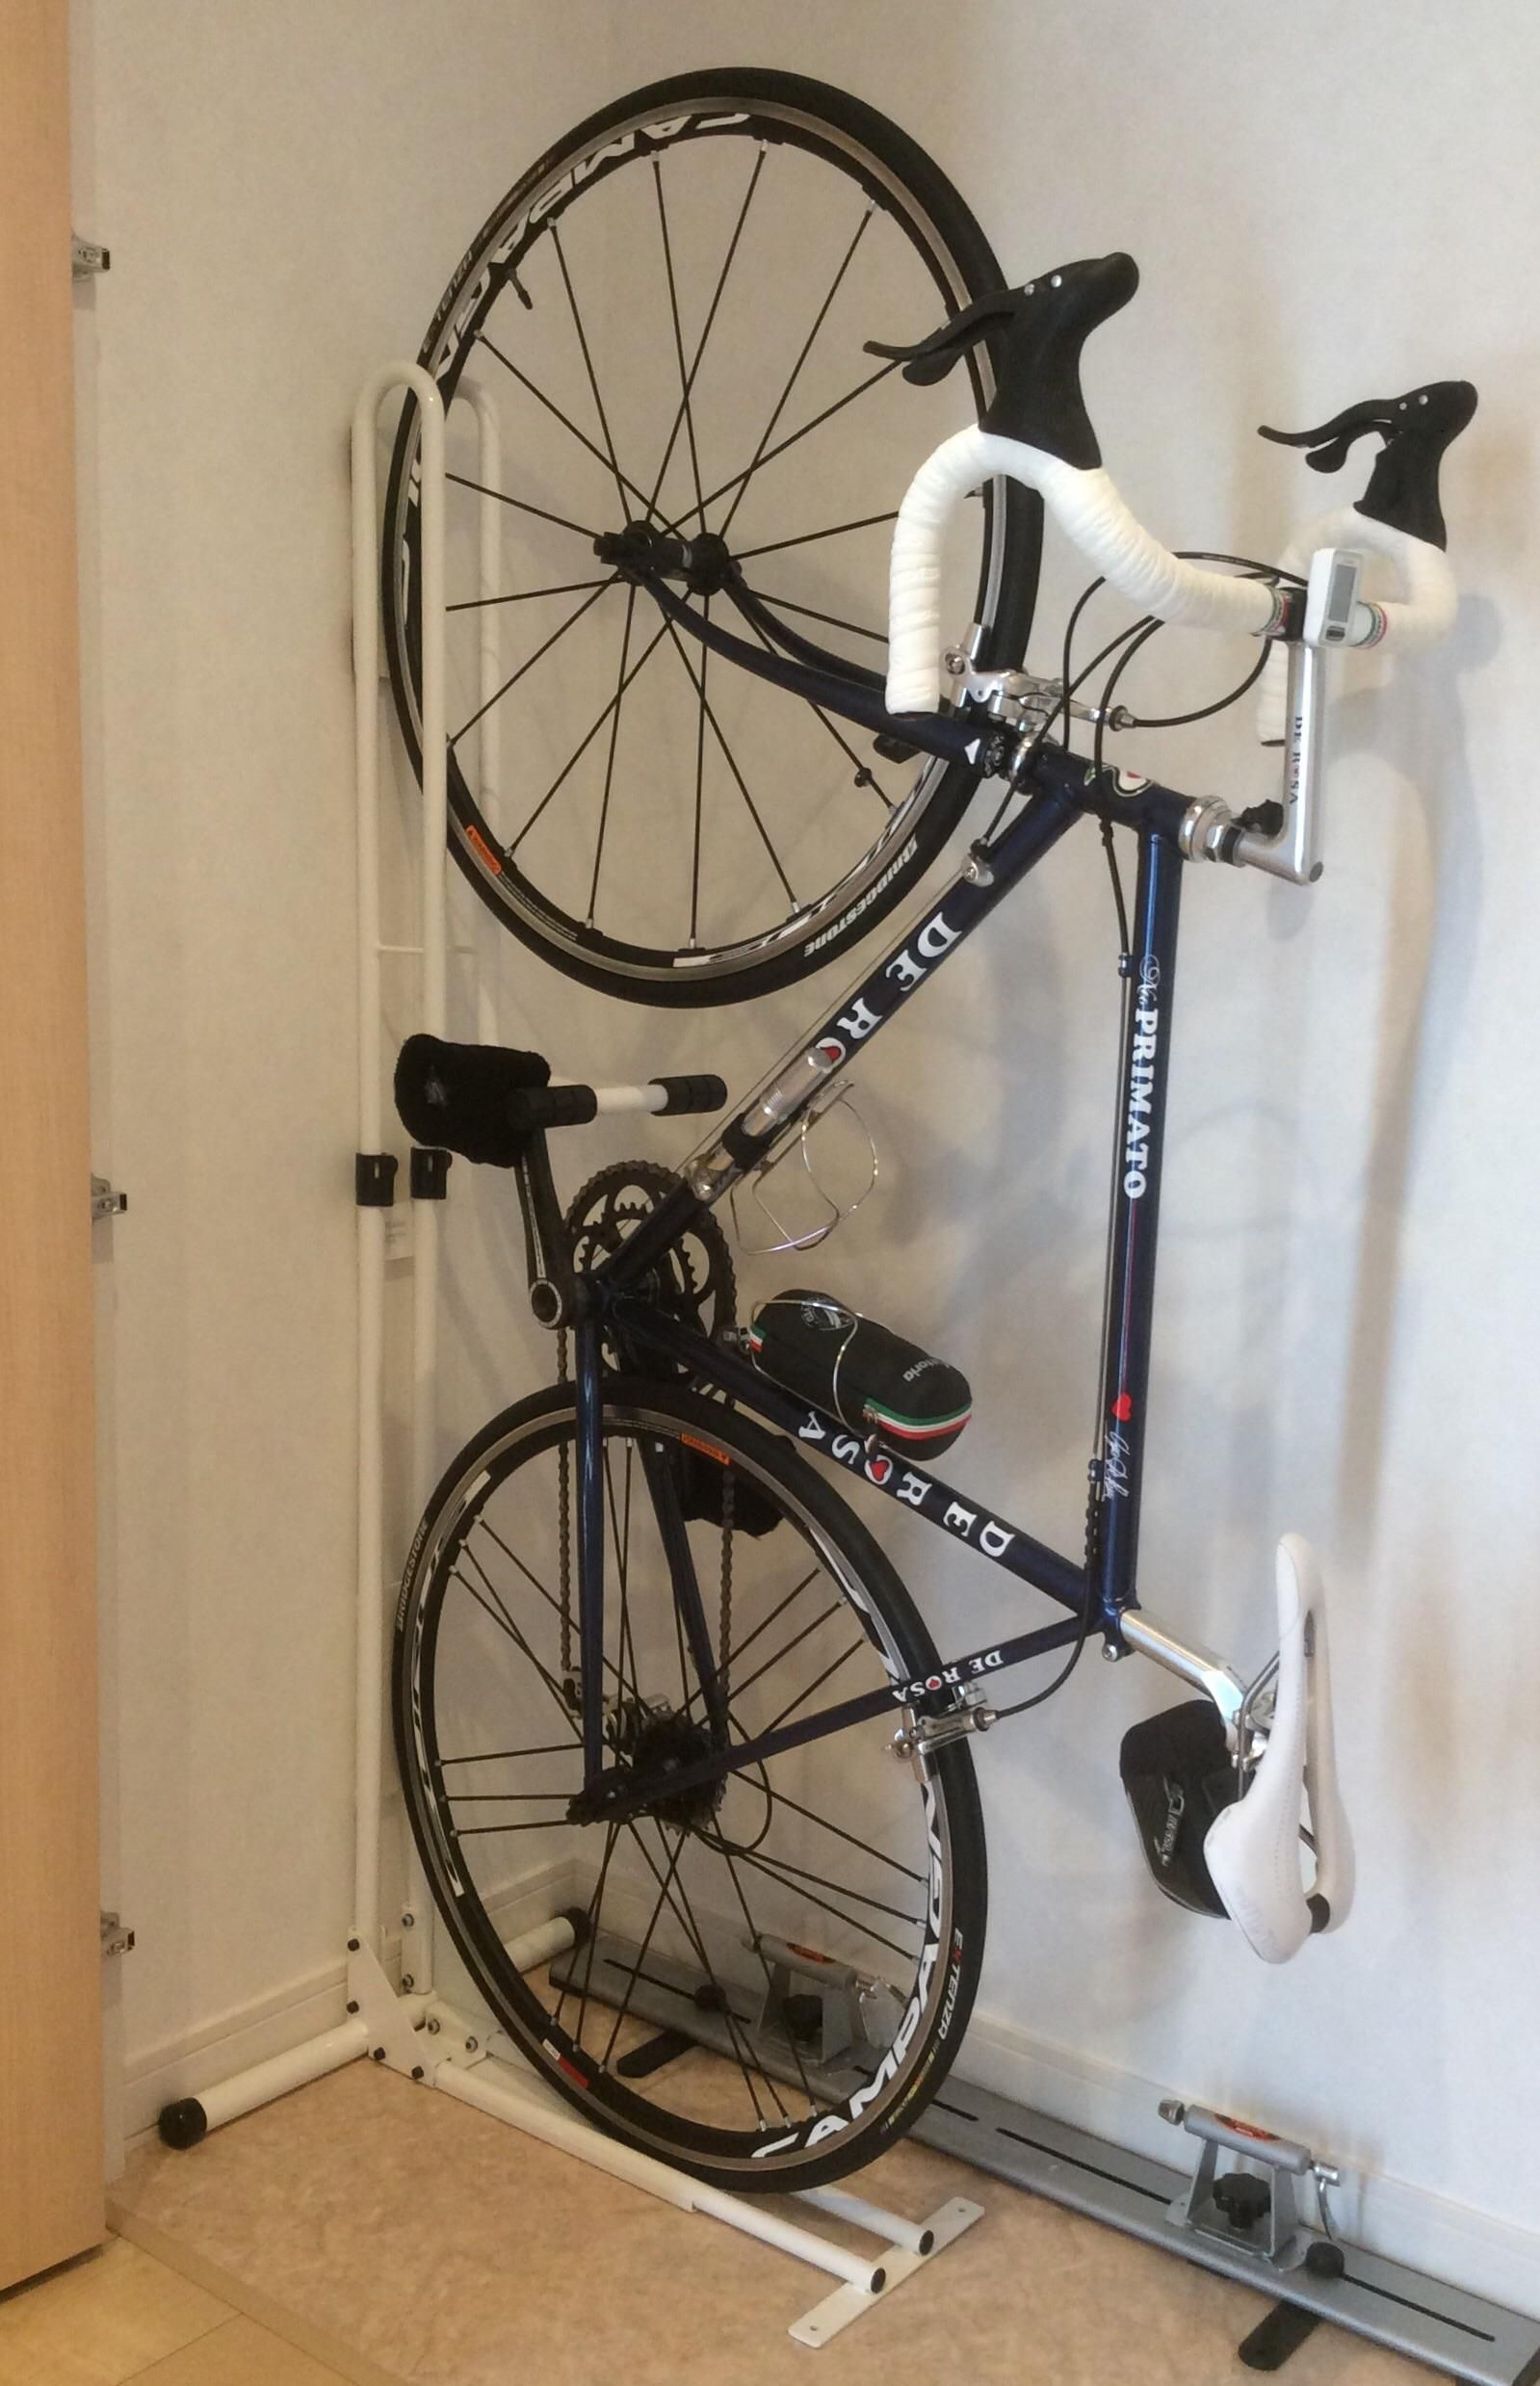 hook bicycle wall bike for garage hanger storage floor new double cycling itm racks rack stand